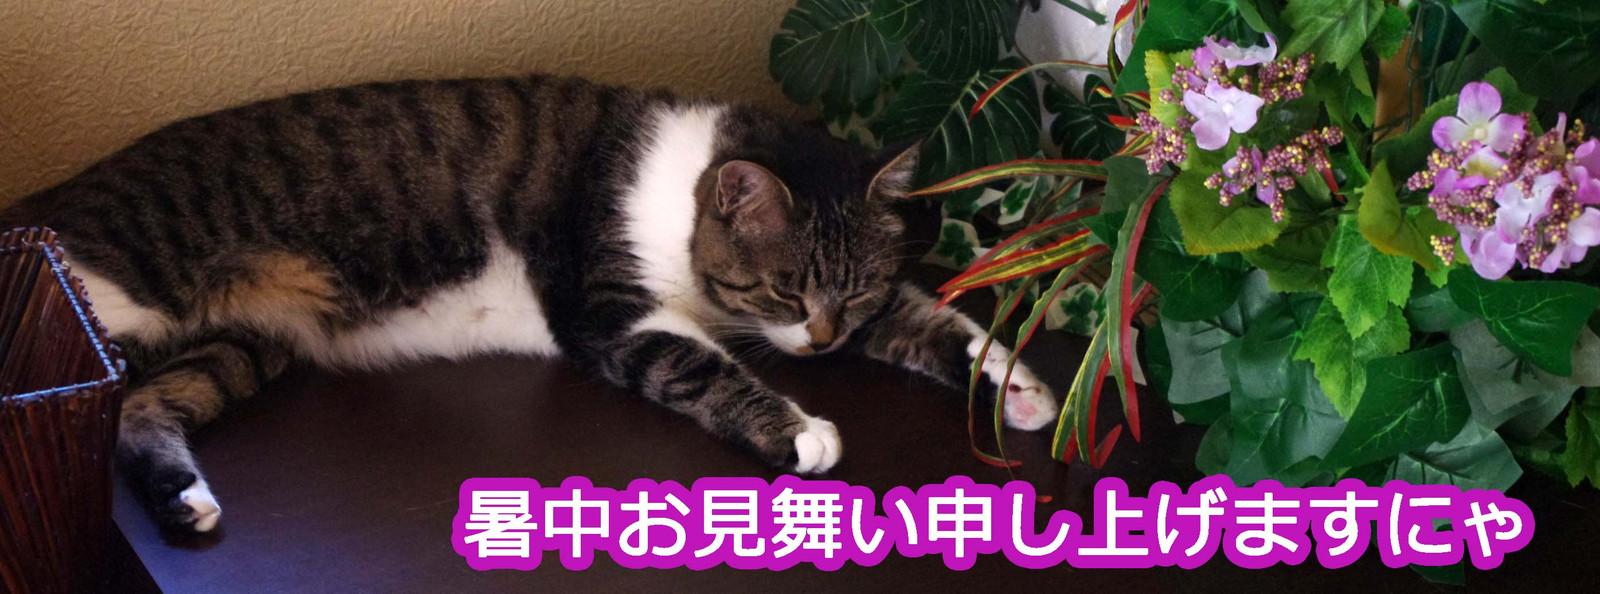 2012_07_28_6590_edited1